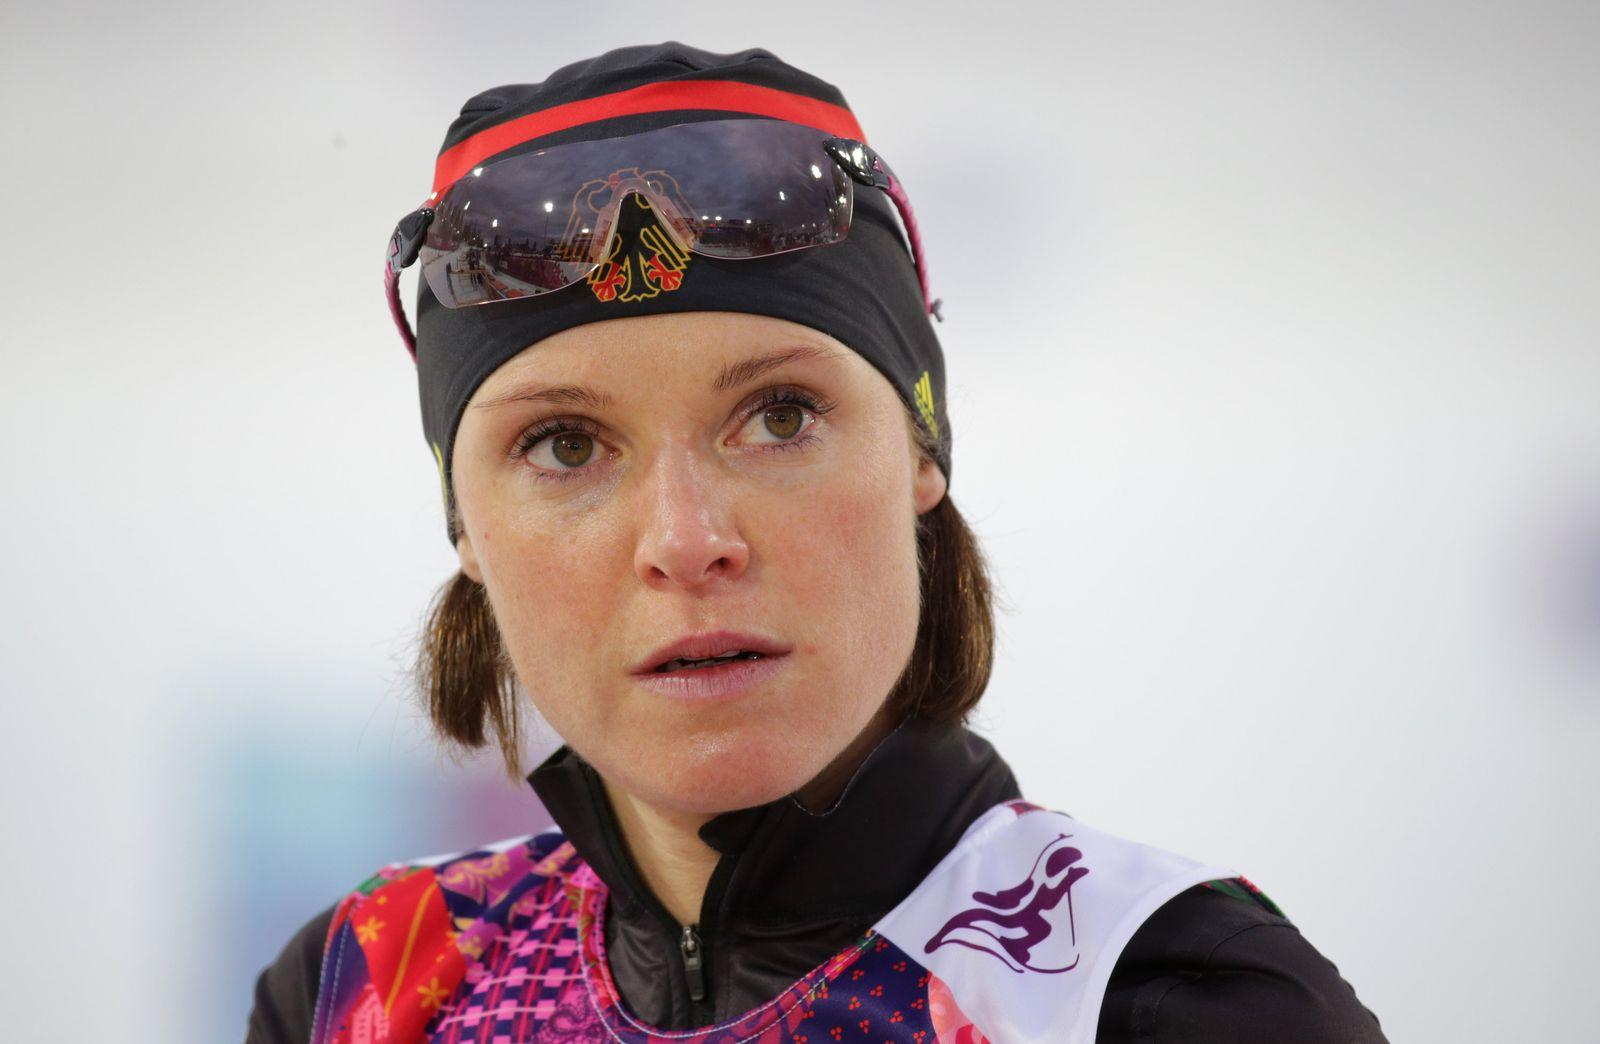 Sotschi 2014 - Evi Sachenbacher-Stehle